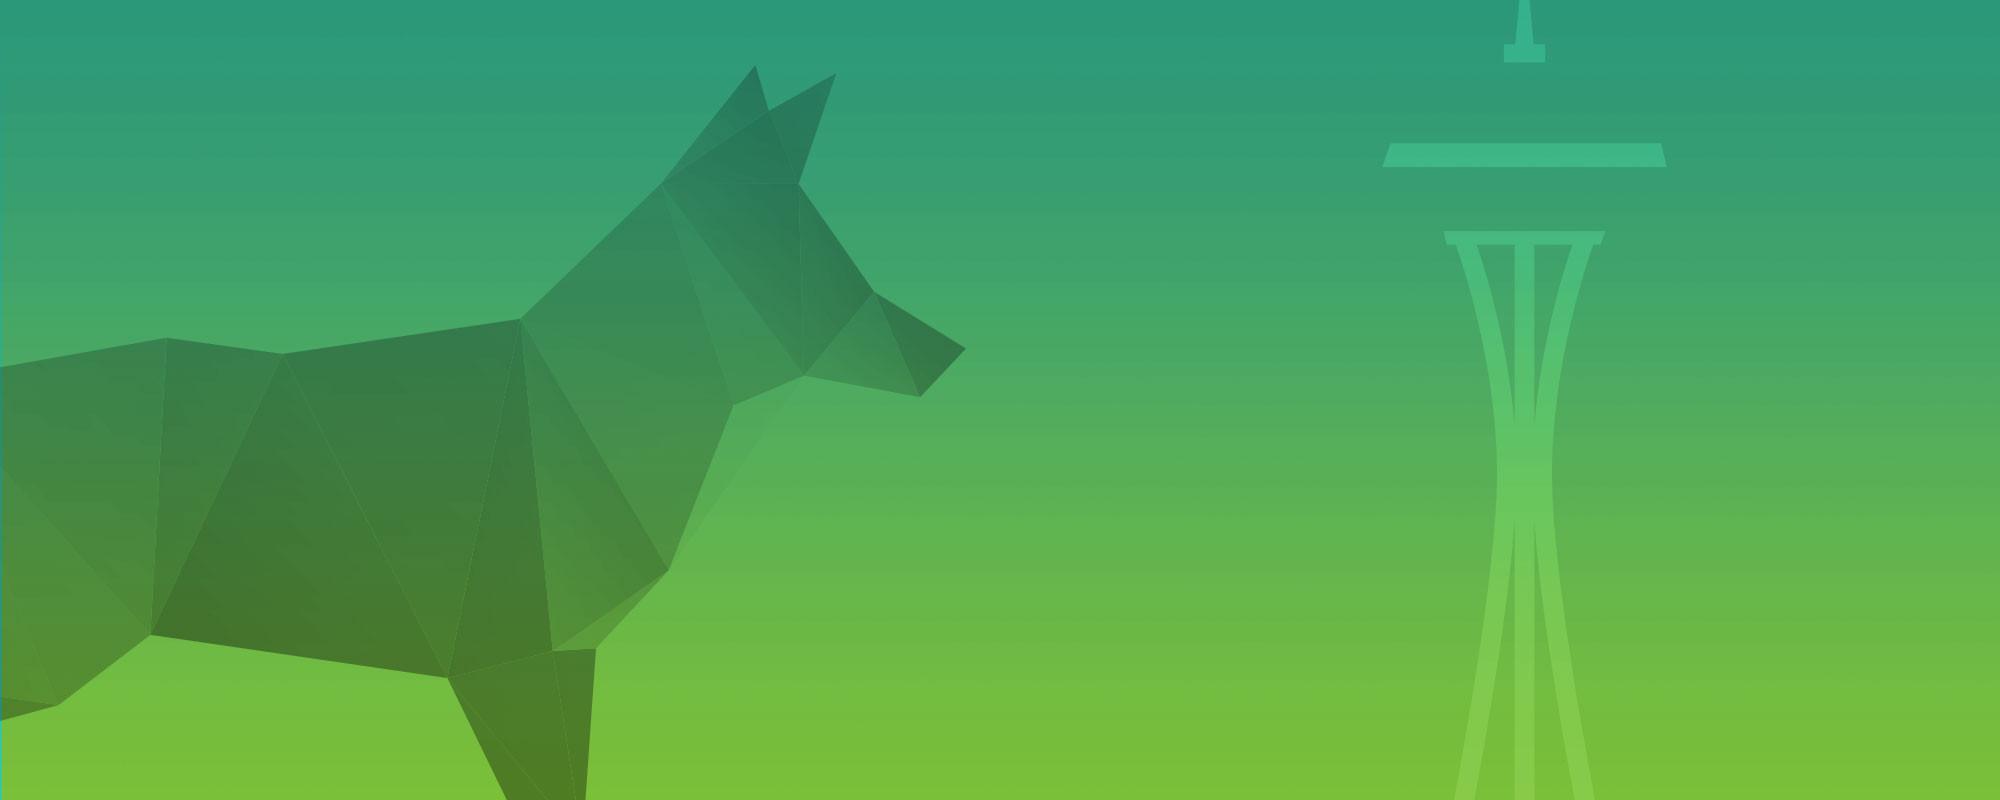 WBAALAS Dog Image